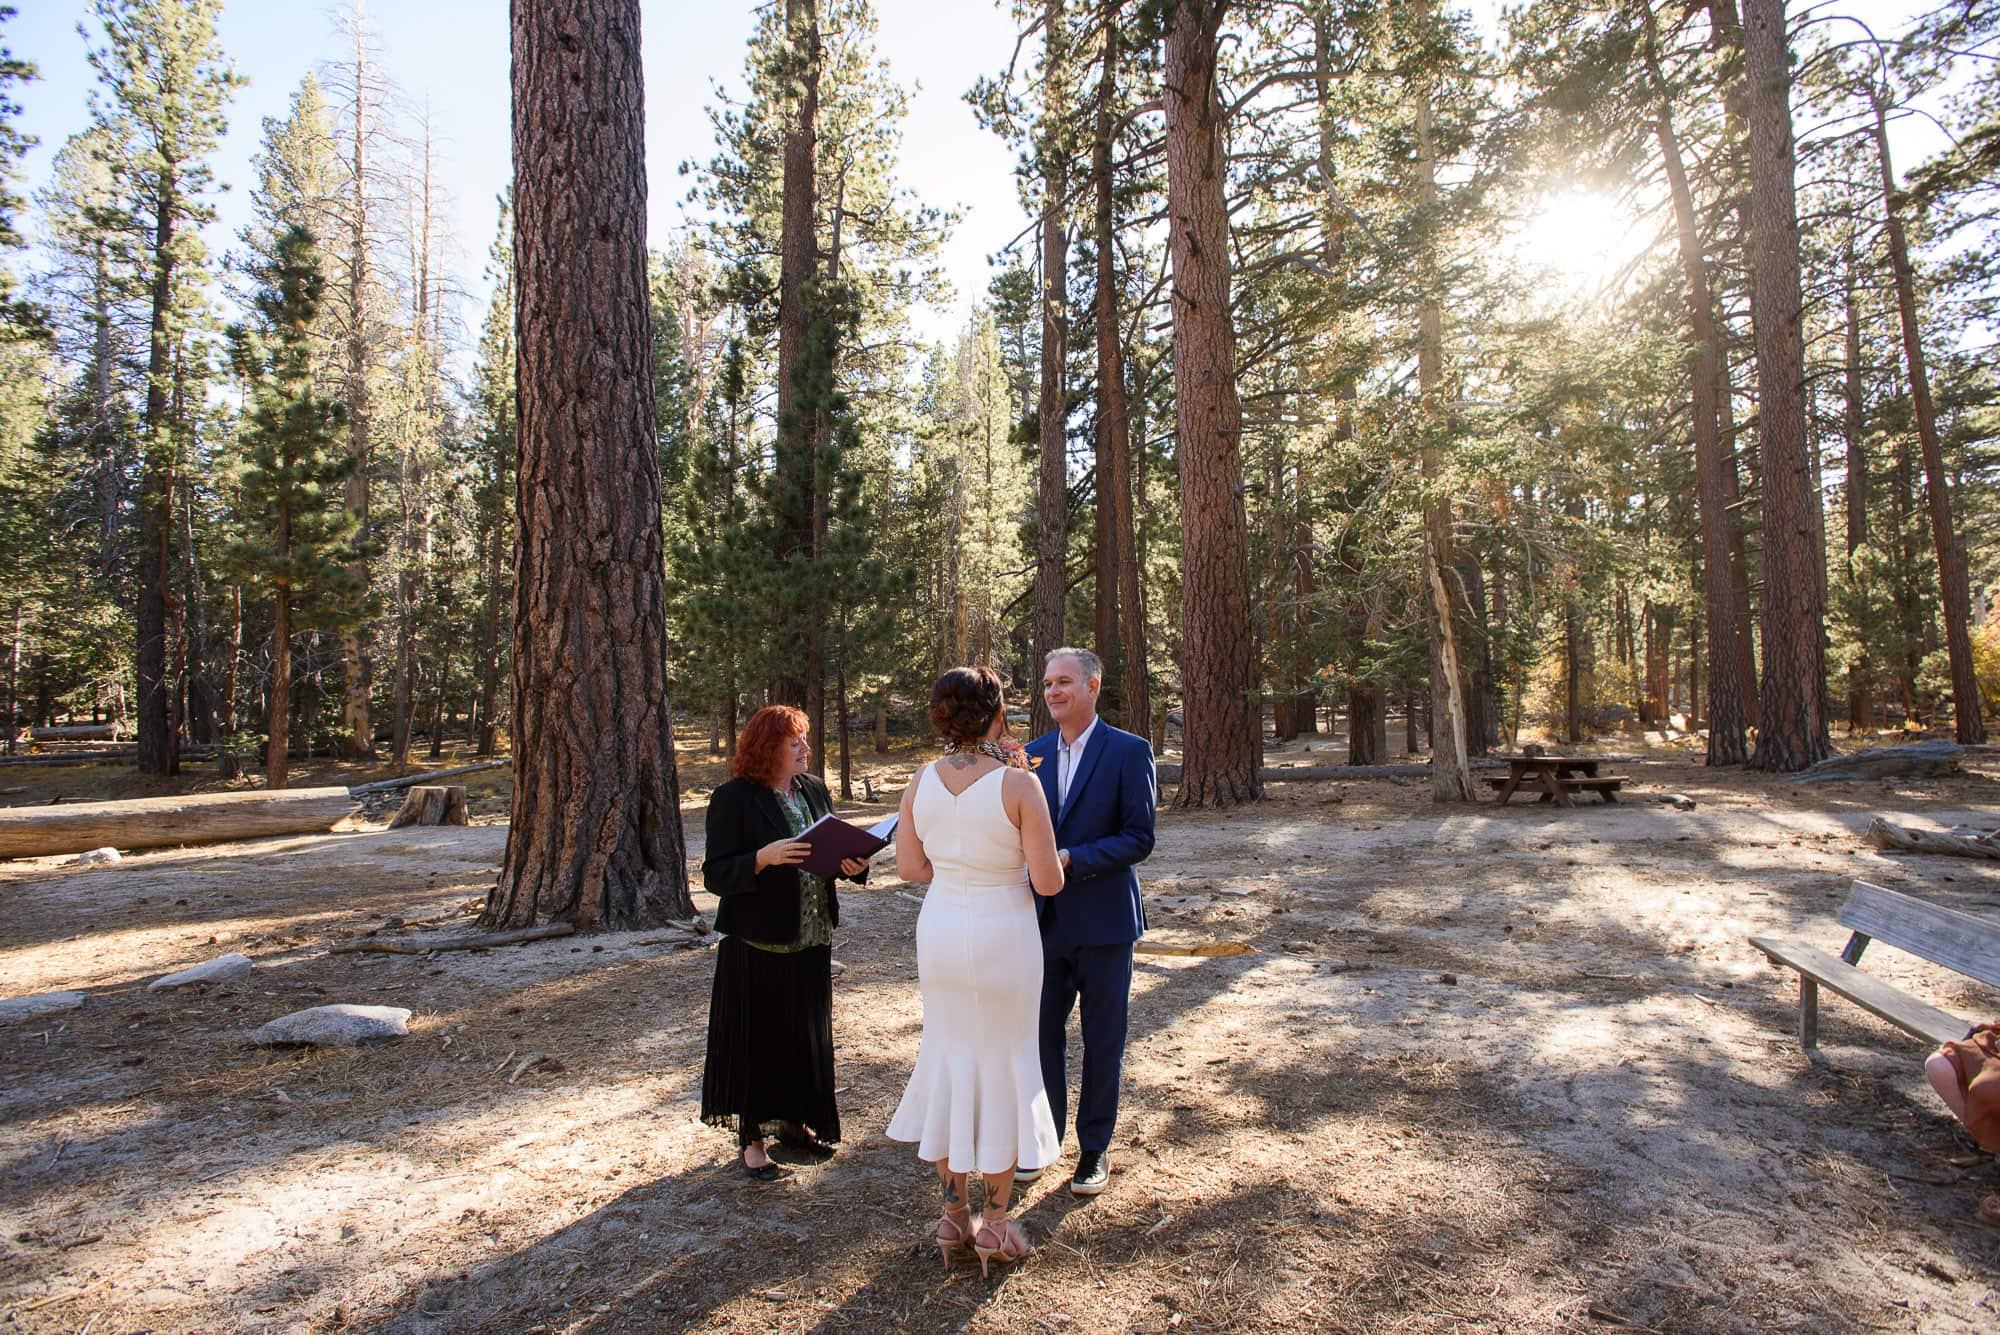 021_Alan_and_Heidi_Palm_Springs_Tram_Wedding